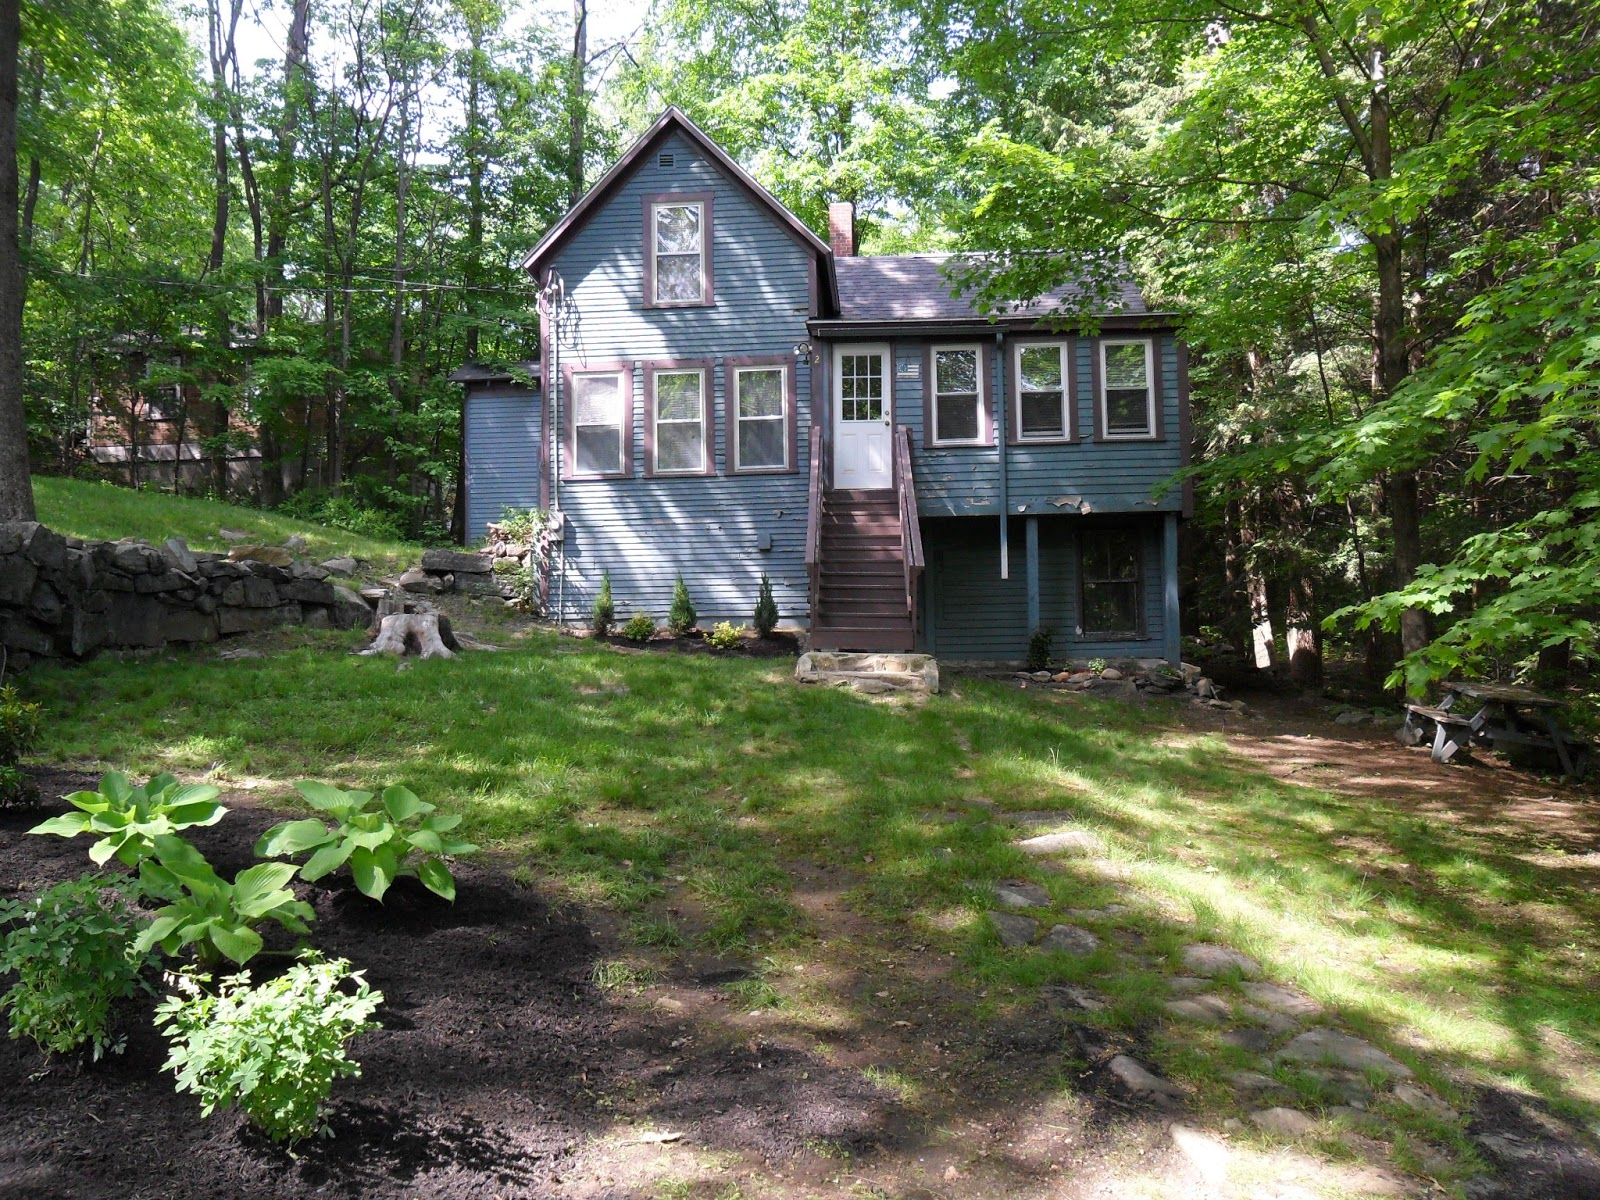 loft & cottage: choosing exterior paint colors for the cabin